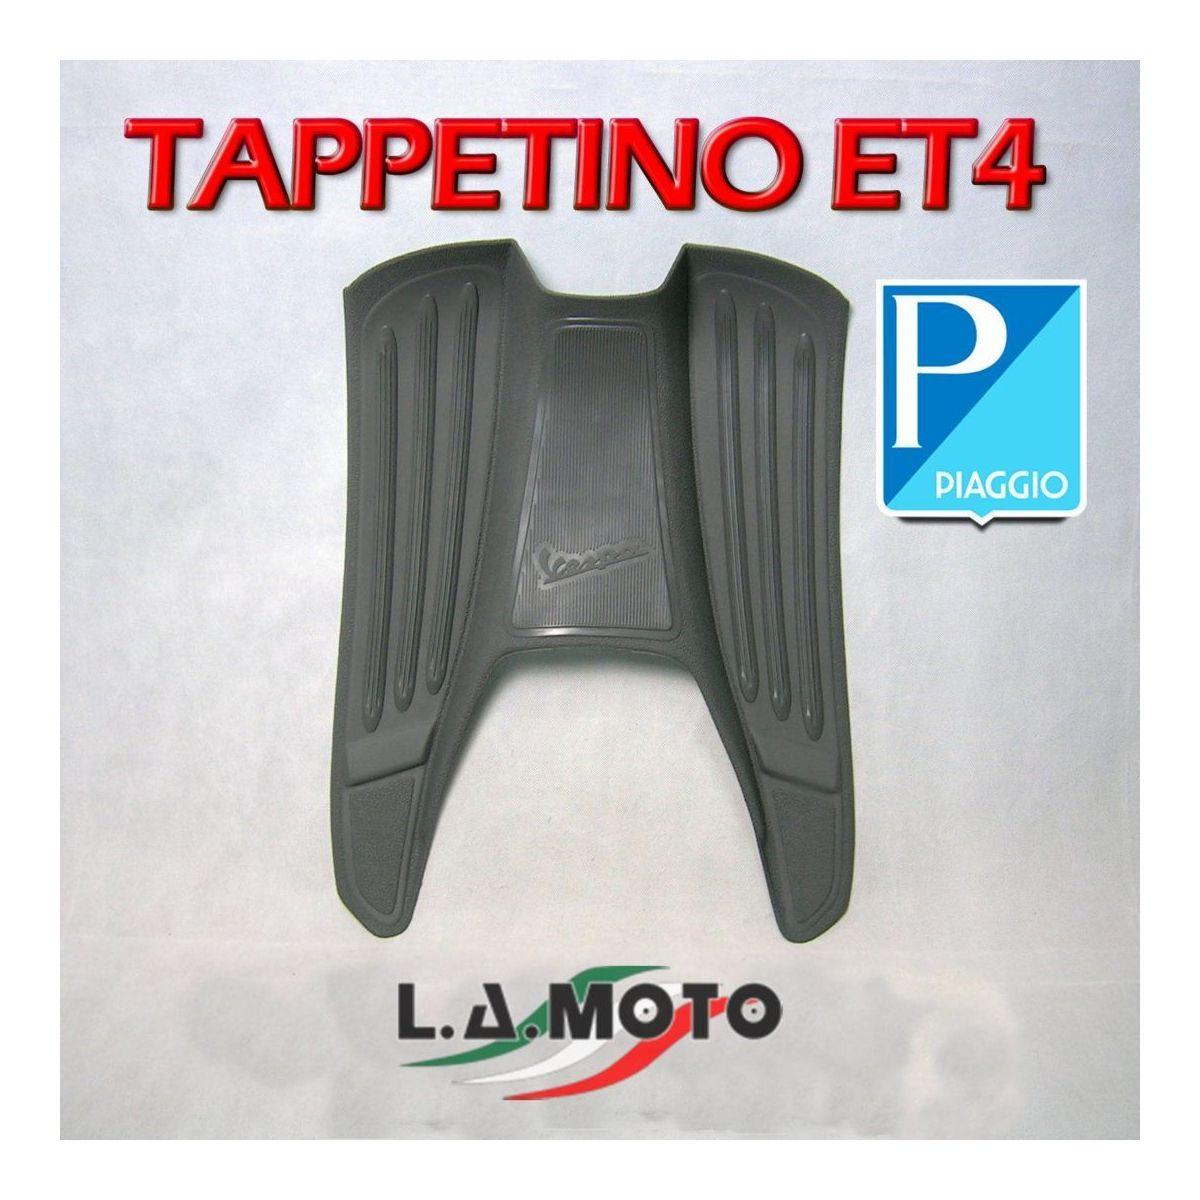 Tappetino pedana vespa ete2-et4 art 100034m000